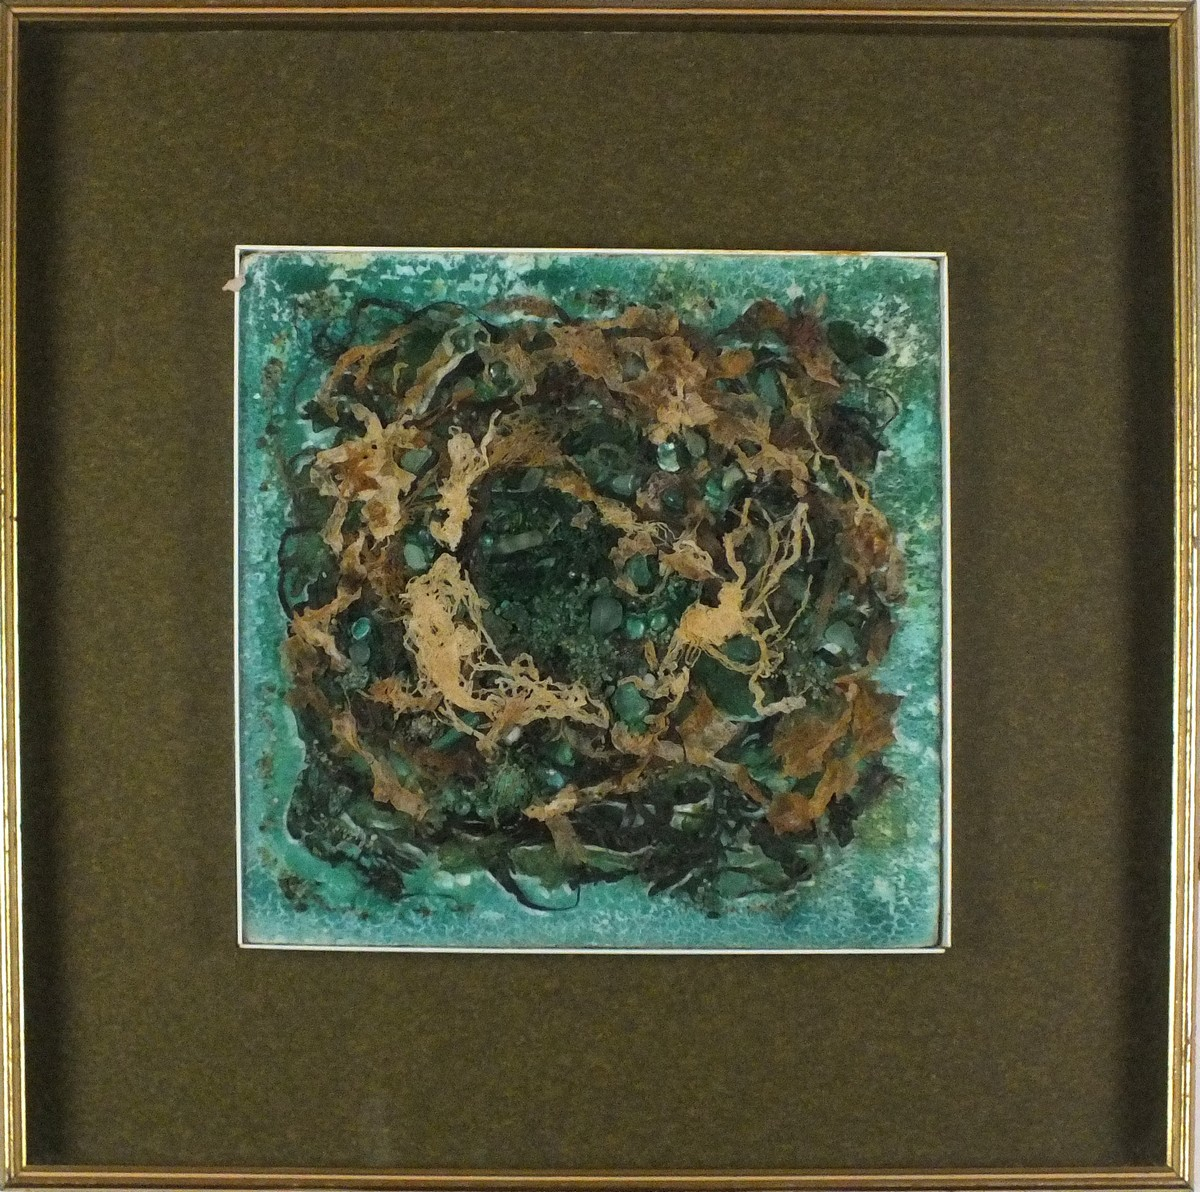 Lot 42 - Jean HAYLETT (British 1924-2018)Sea Scene, Mixed media including seaweed, Artists details verso,